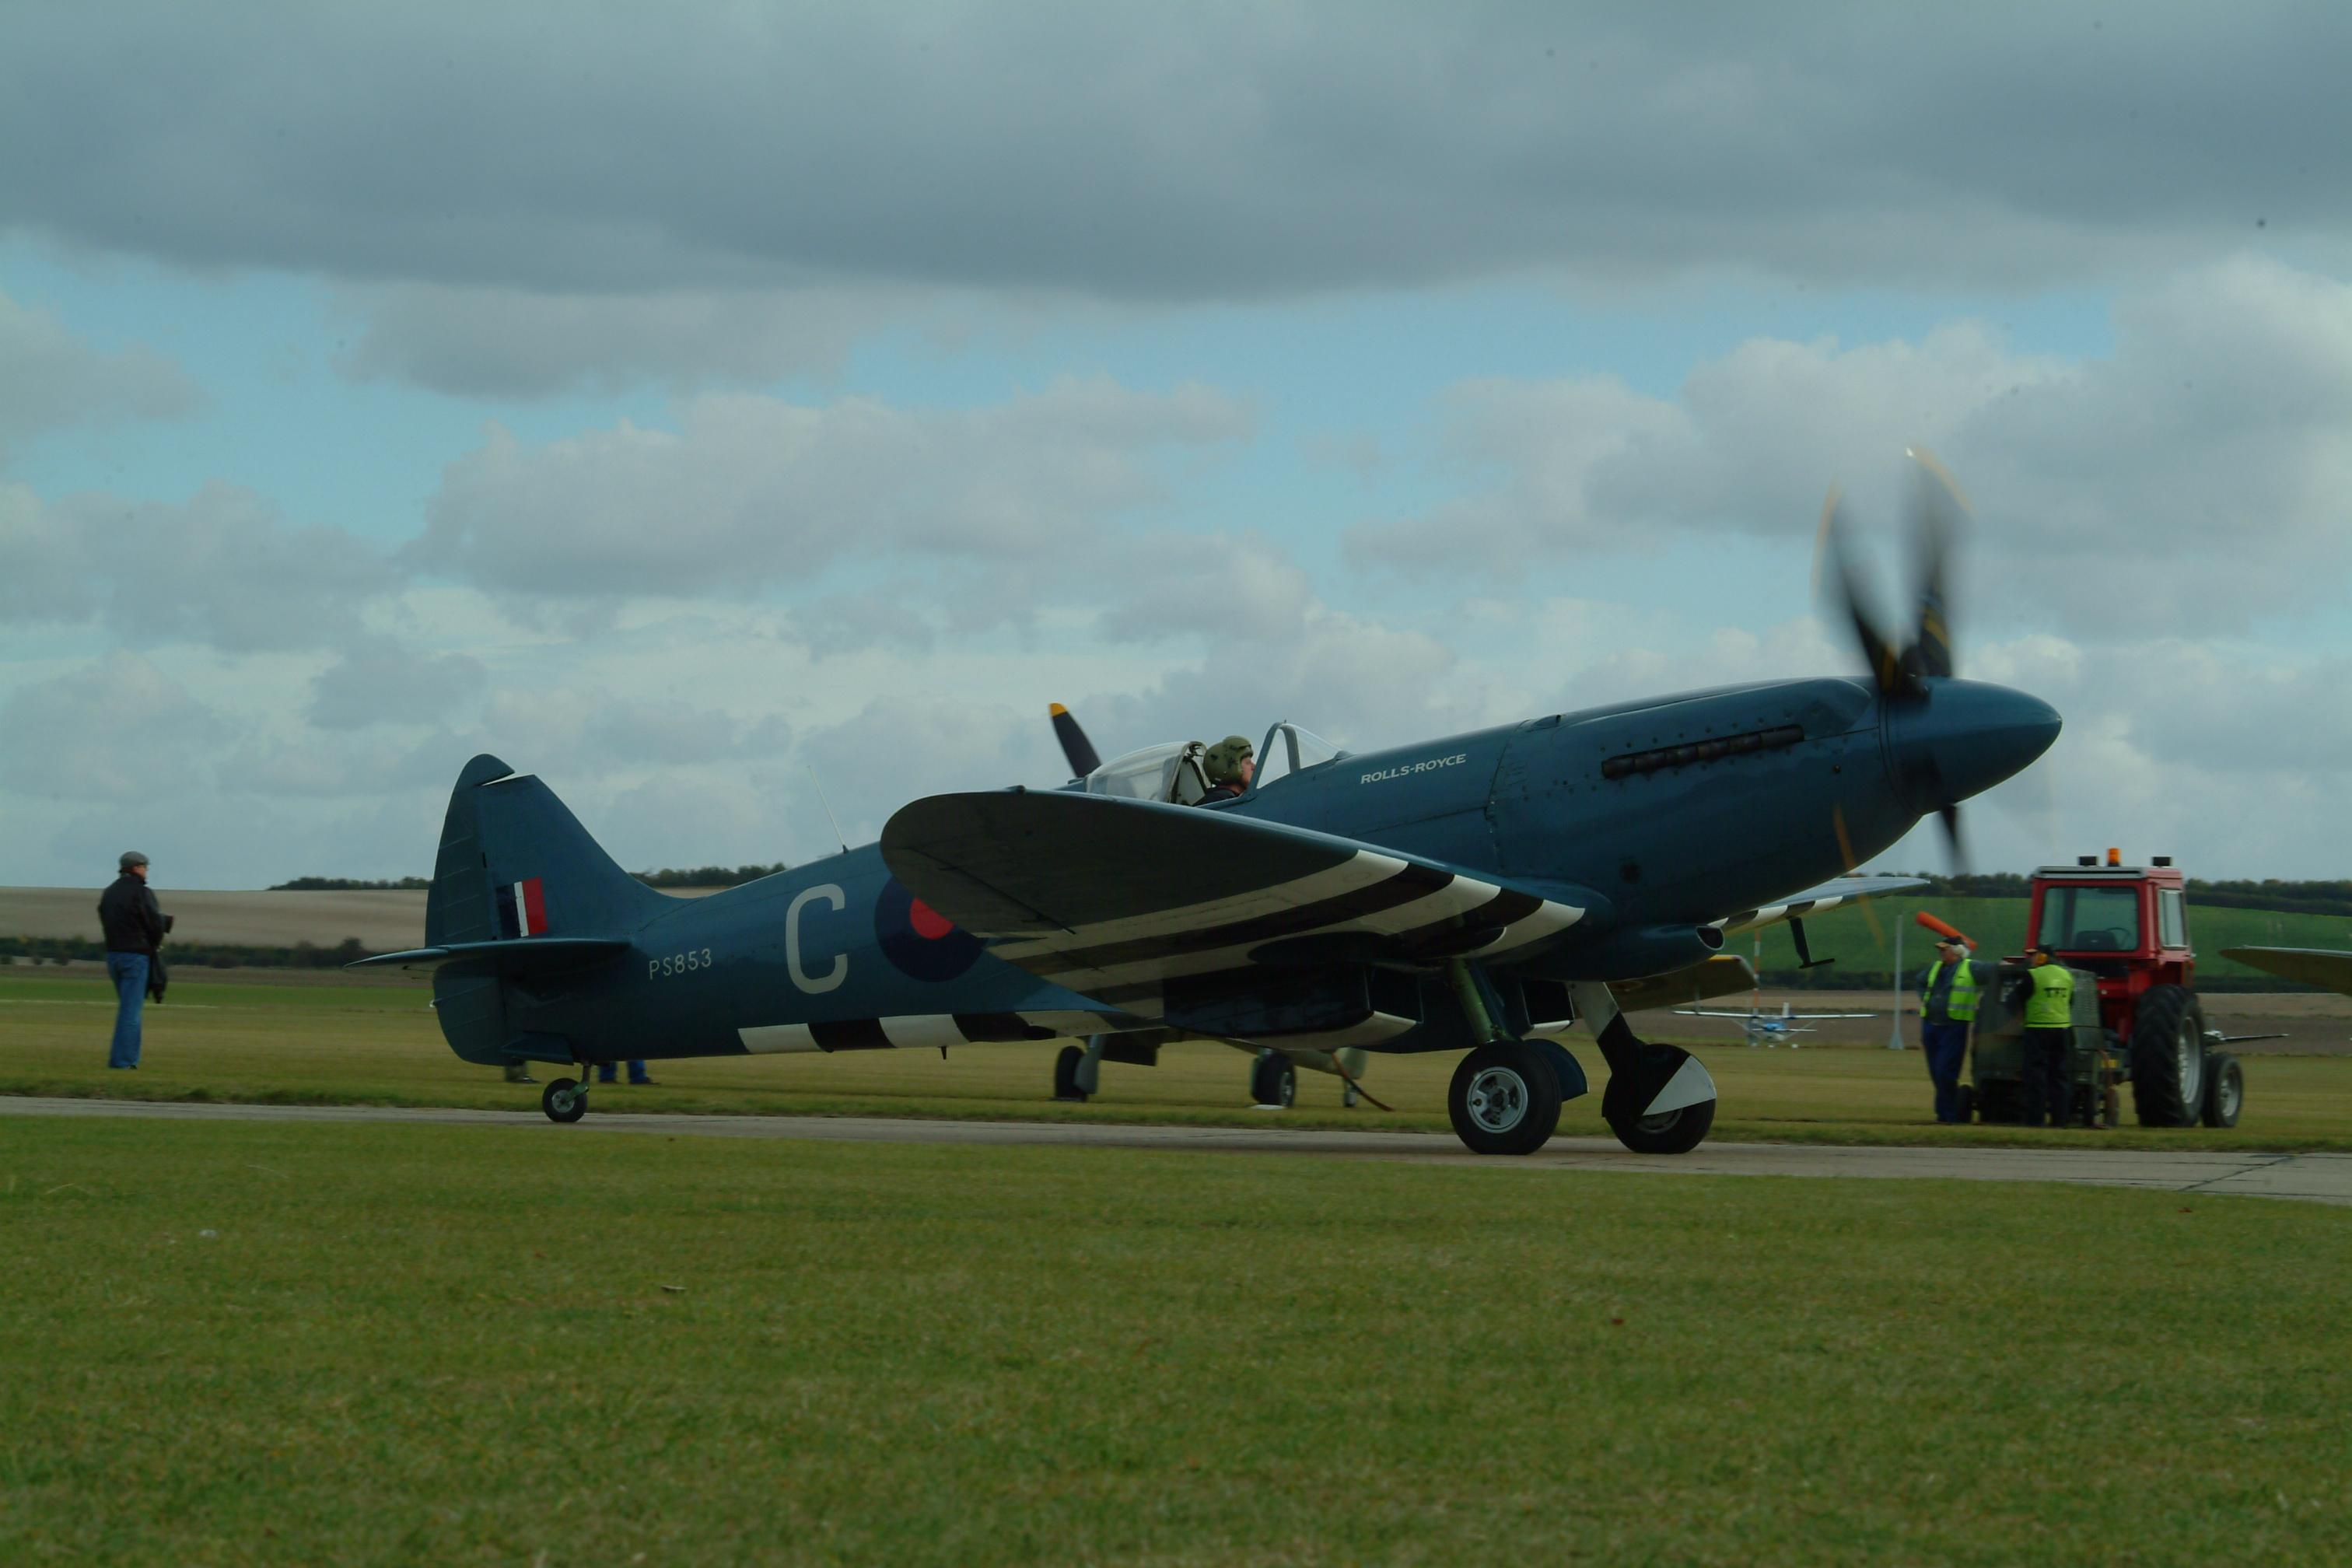 D026 Supermarine Spitfire